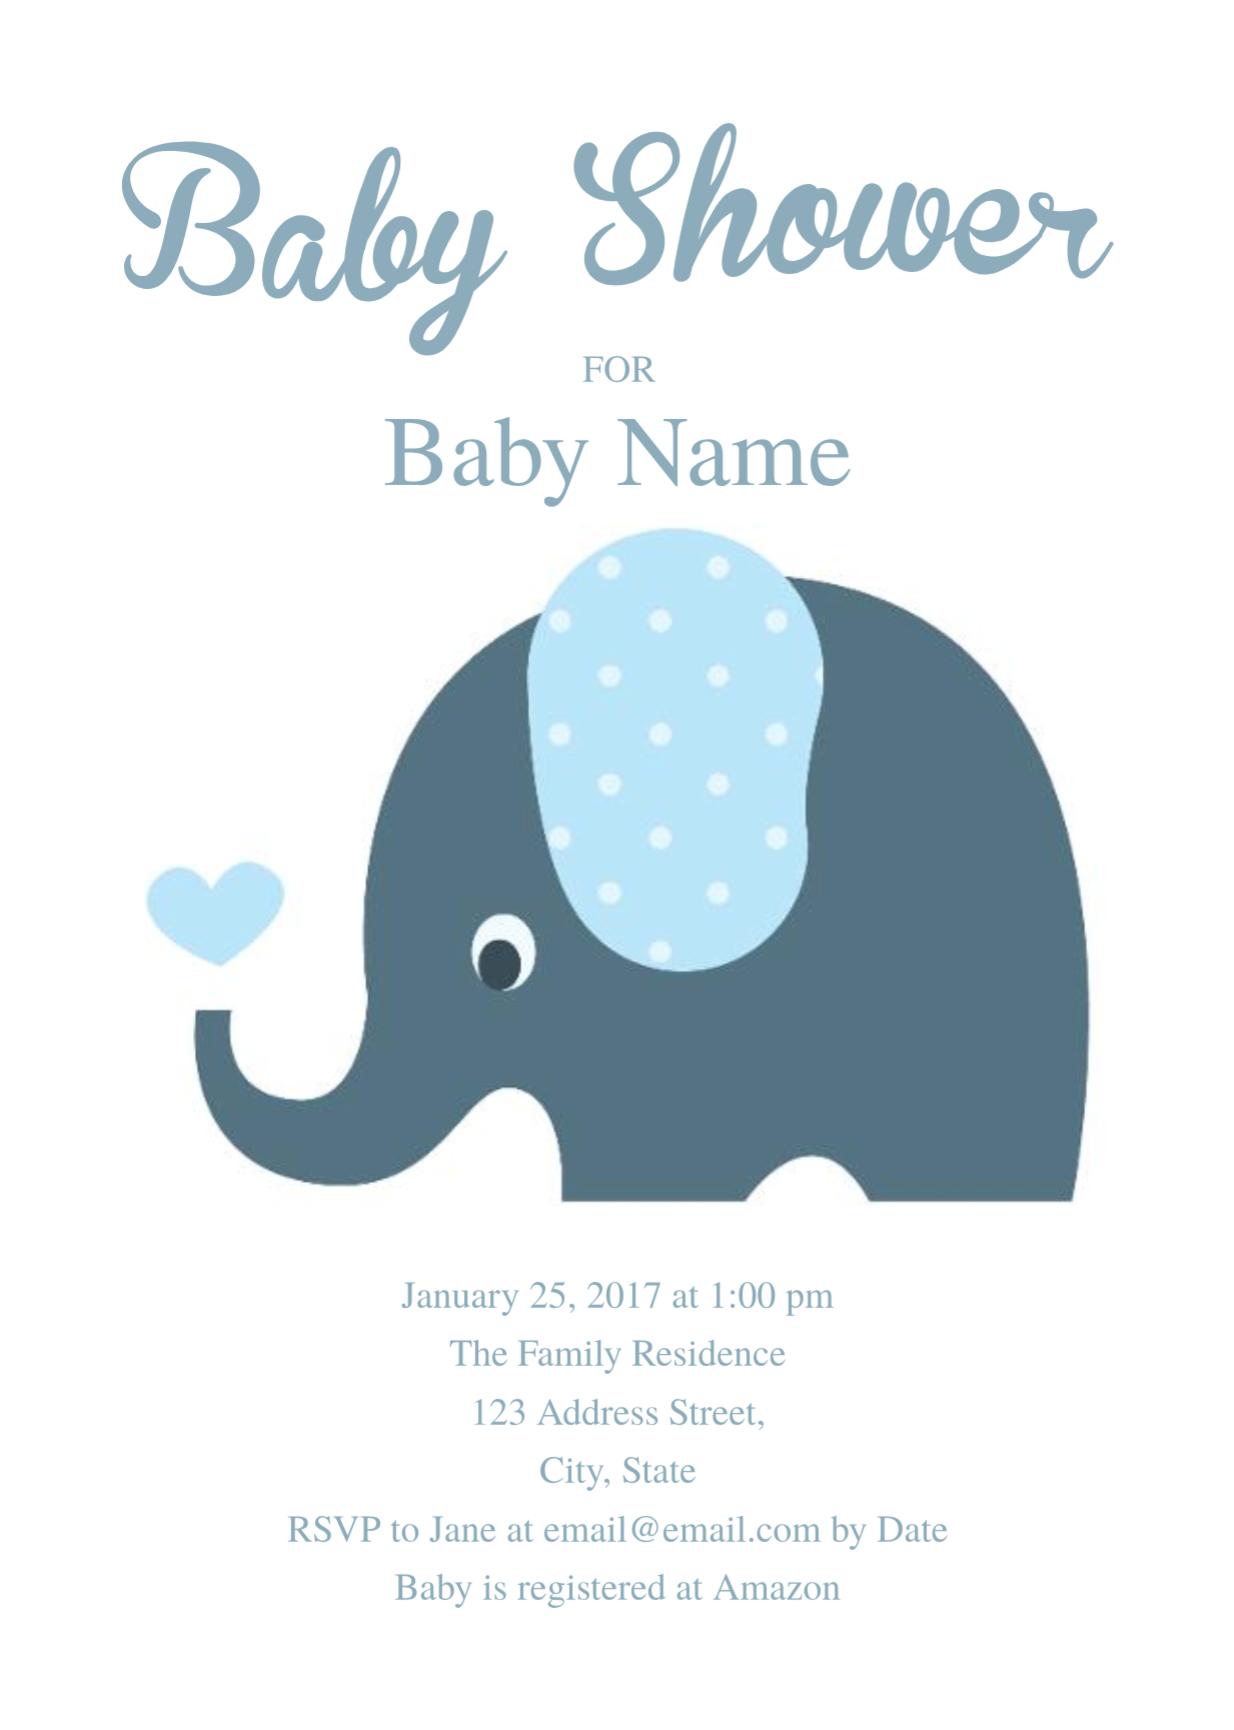 Cute Elephant Baby Shower Invitation Template | Free Invitation - Free Printable Baby Shower Cards Templates